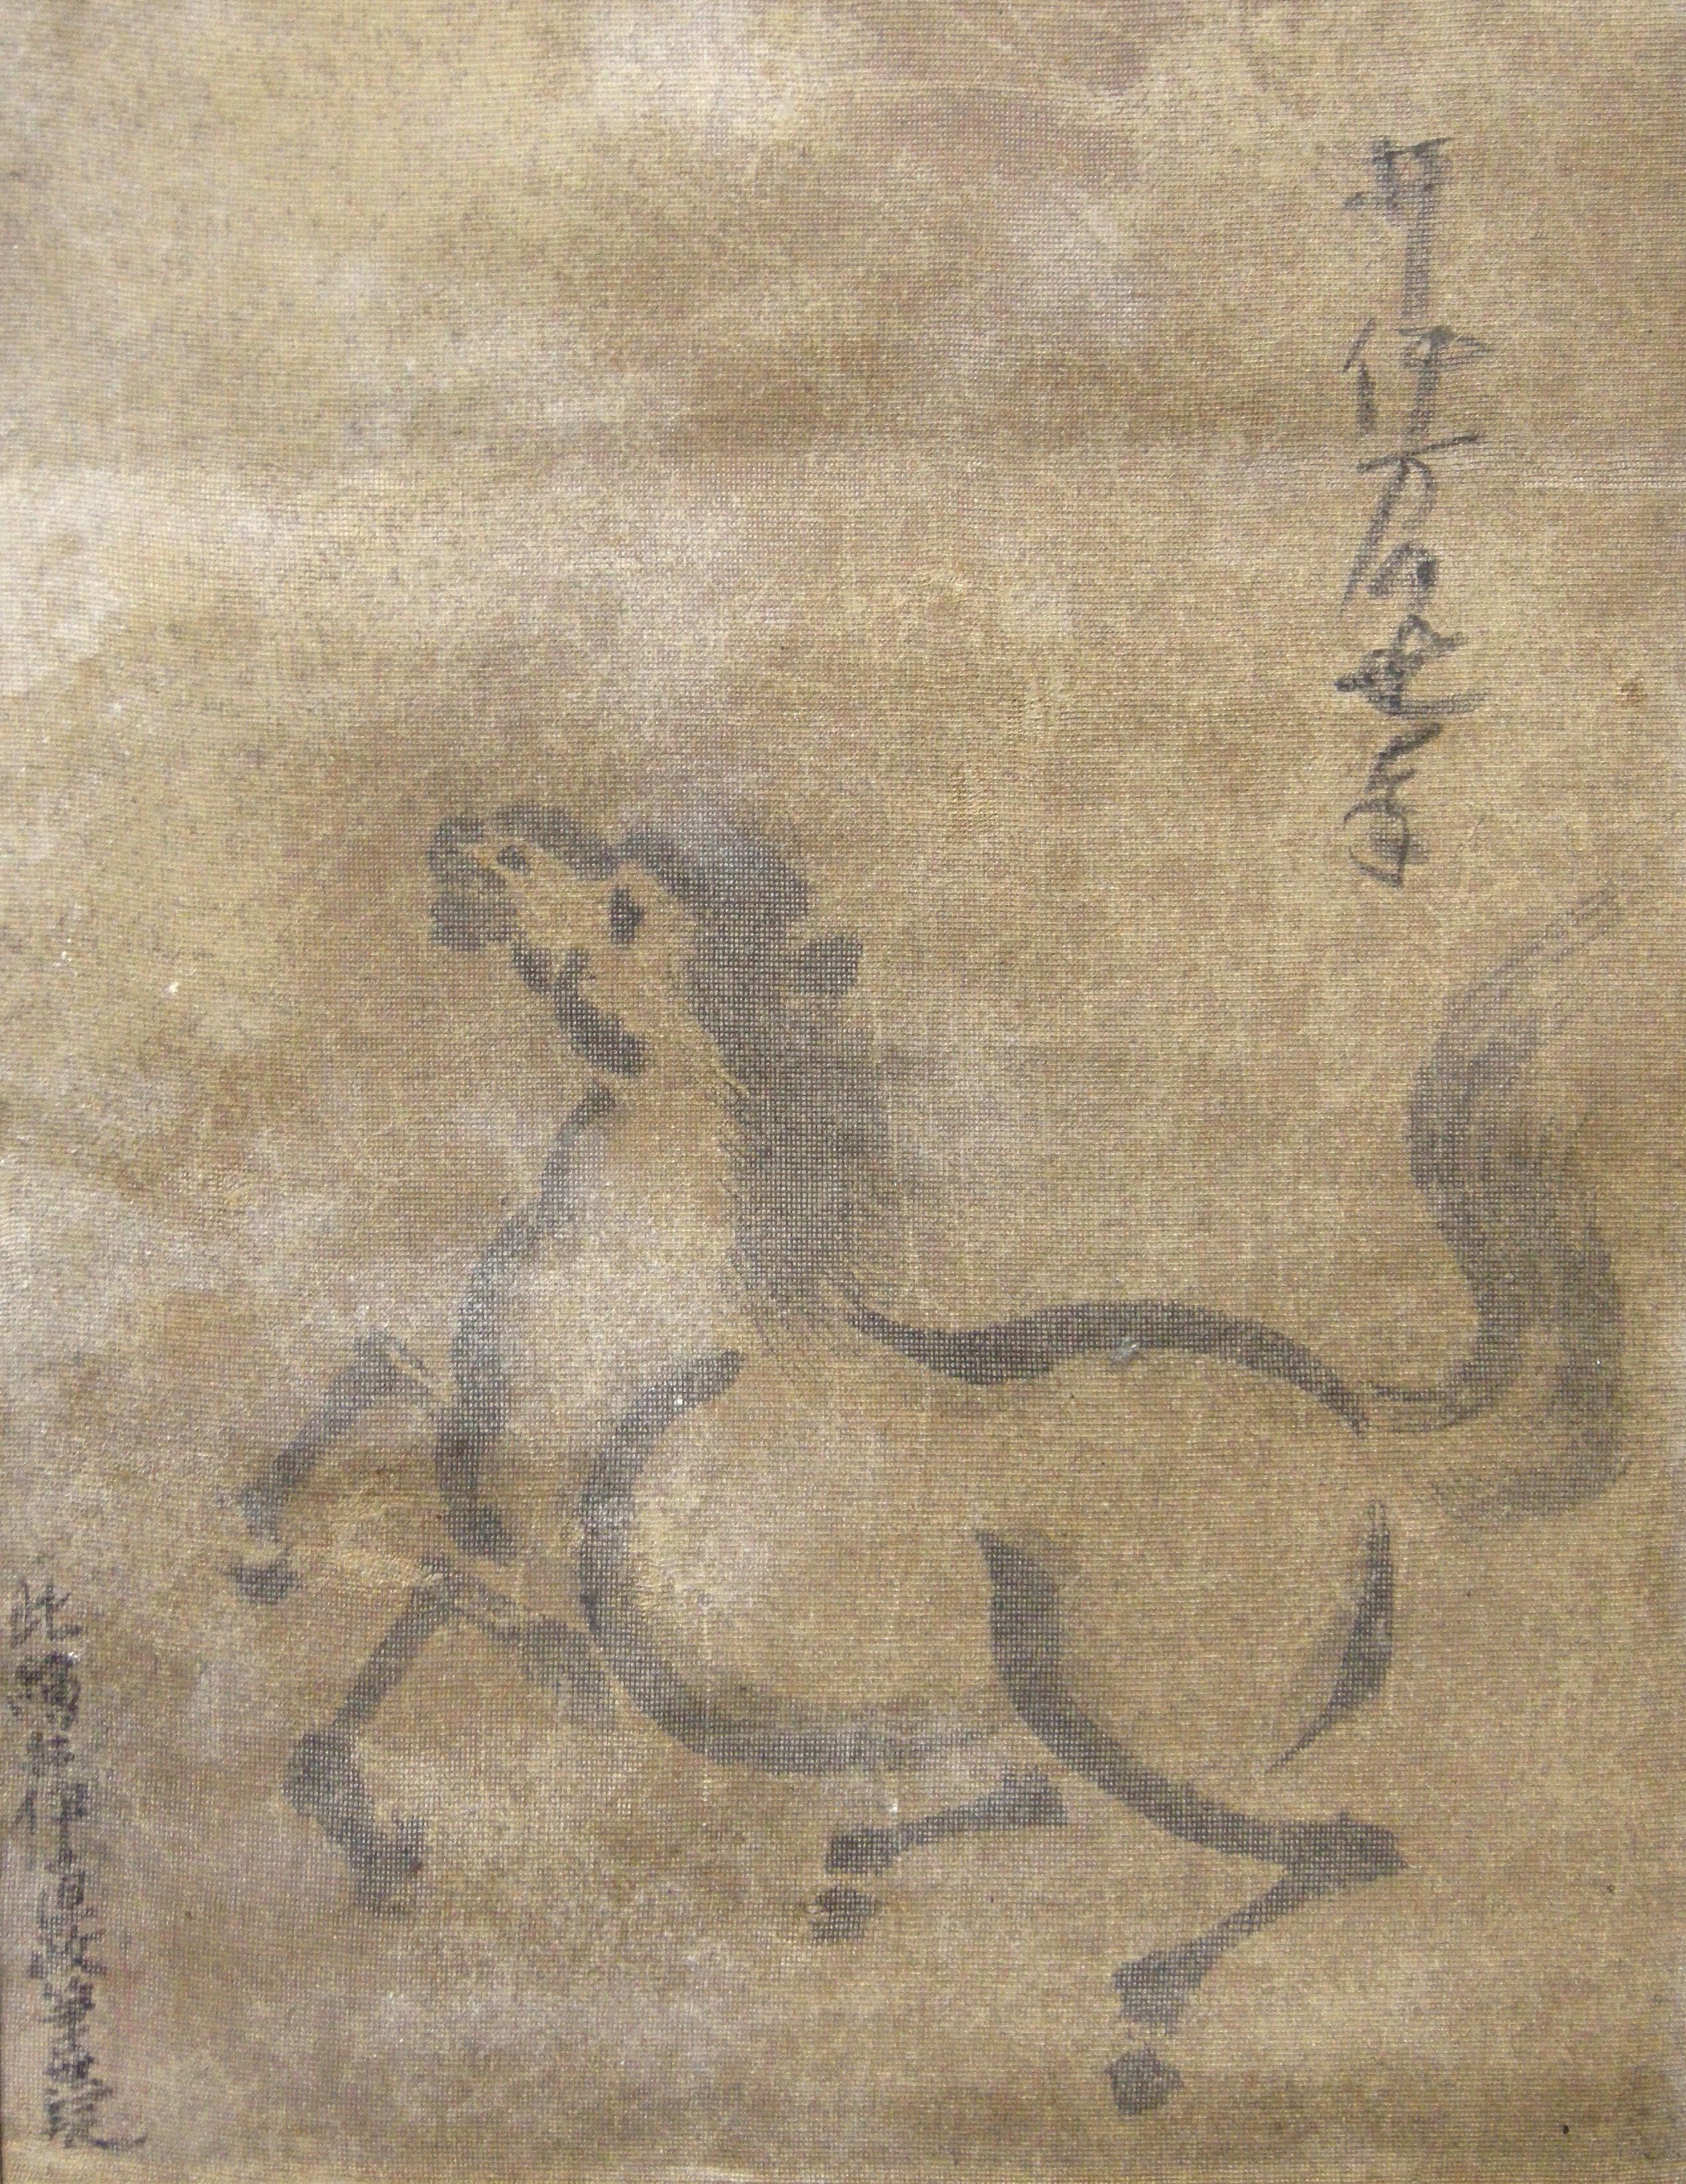 井伊万千代直政幼児の馬の絵